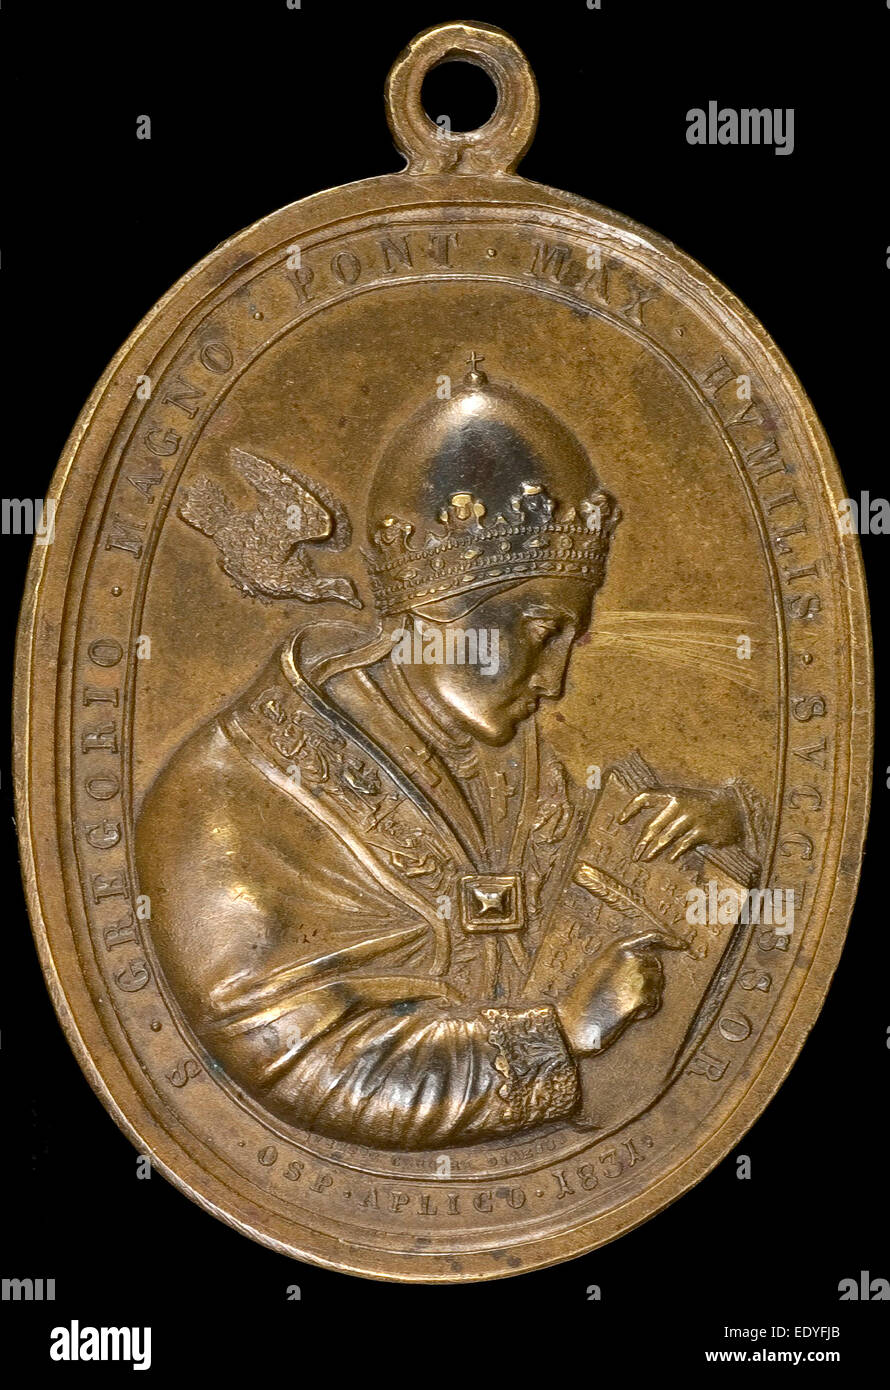 Giuseppe Cerbara, Gregory XVI (Bartolomeo Alberto Cappellari, 1765-1846), Pope 1830 [obverse], Italian, 1770 - 1856, - Stock Image